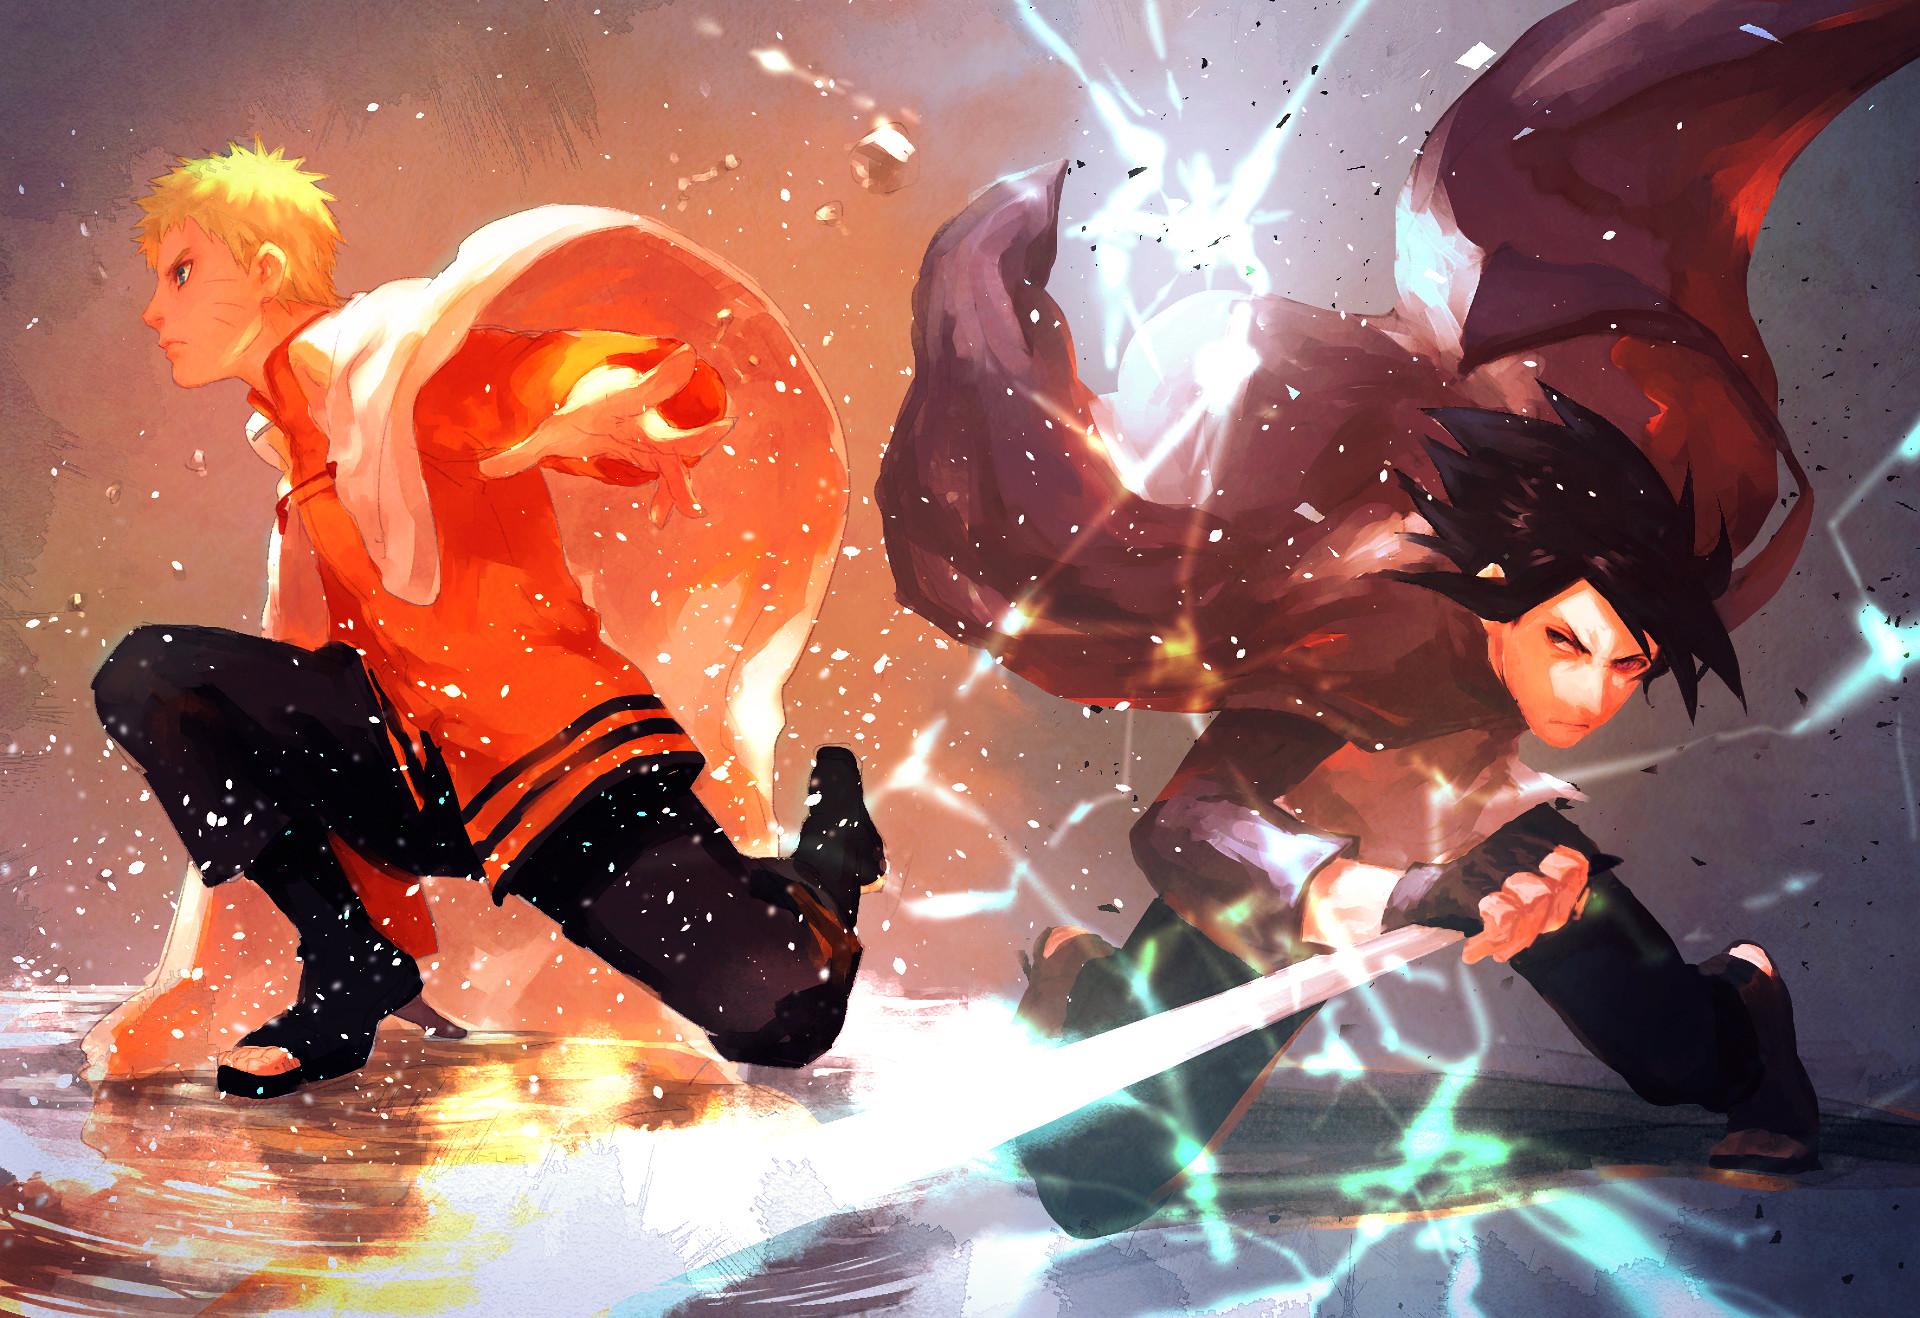 Unduh 60 Koleksi Wallpaper Cave Naruto Sasuke Terbaik